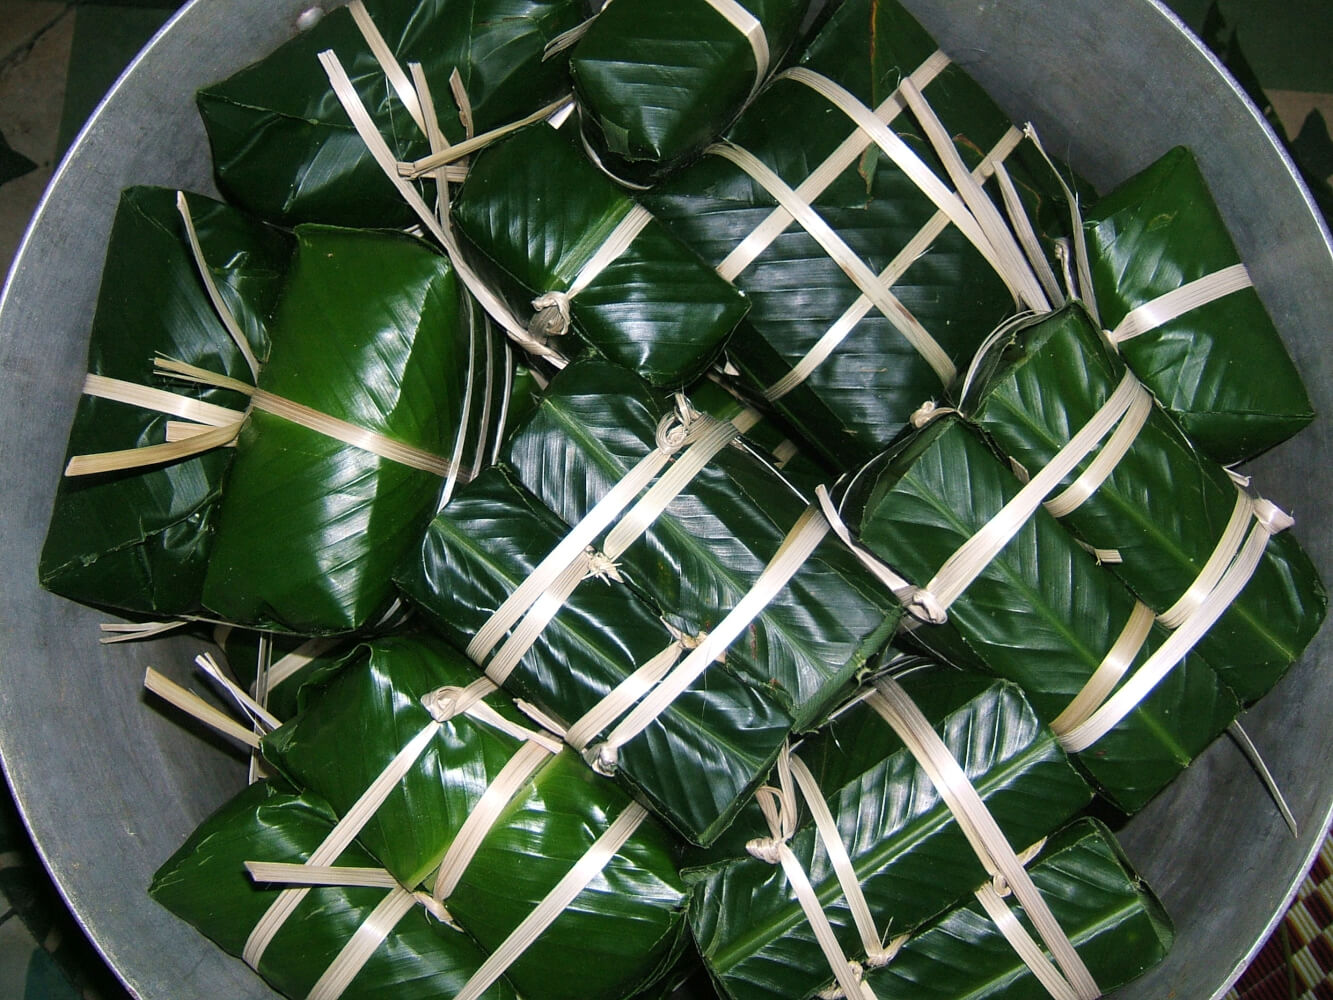 banh chung tet vietnam